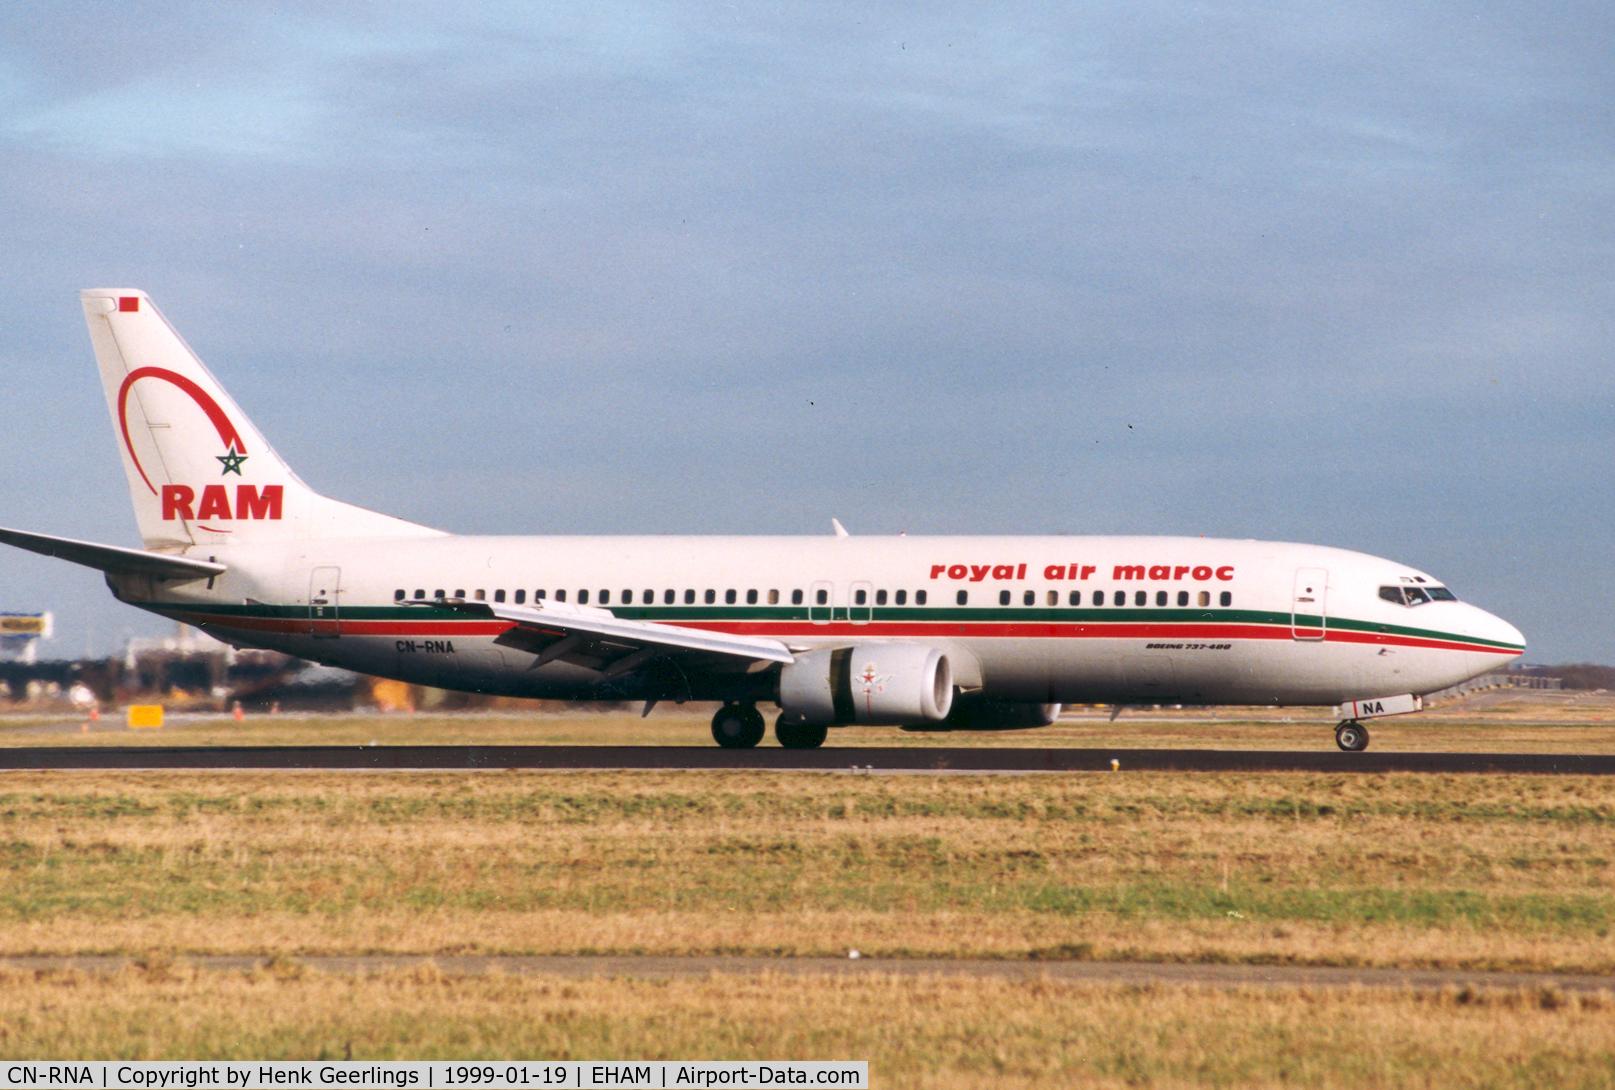 CN-RNA, 1993 Boeing 737-4B6 C/N 26531/2453, royal air maroc - RAM